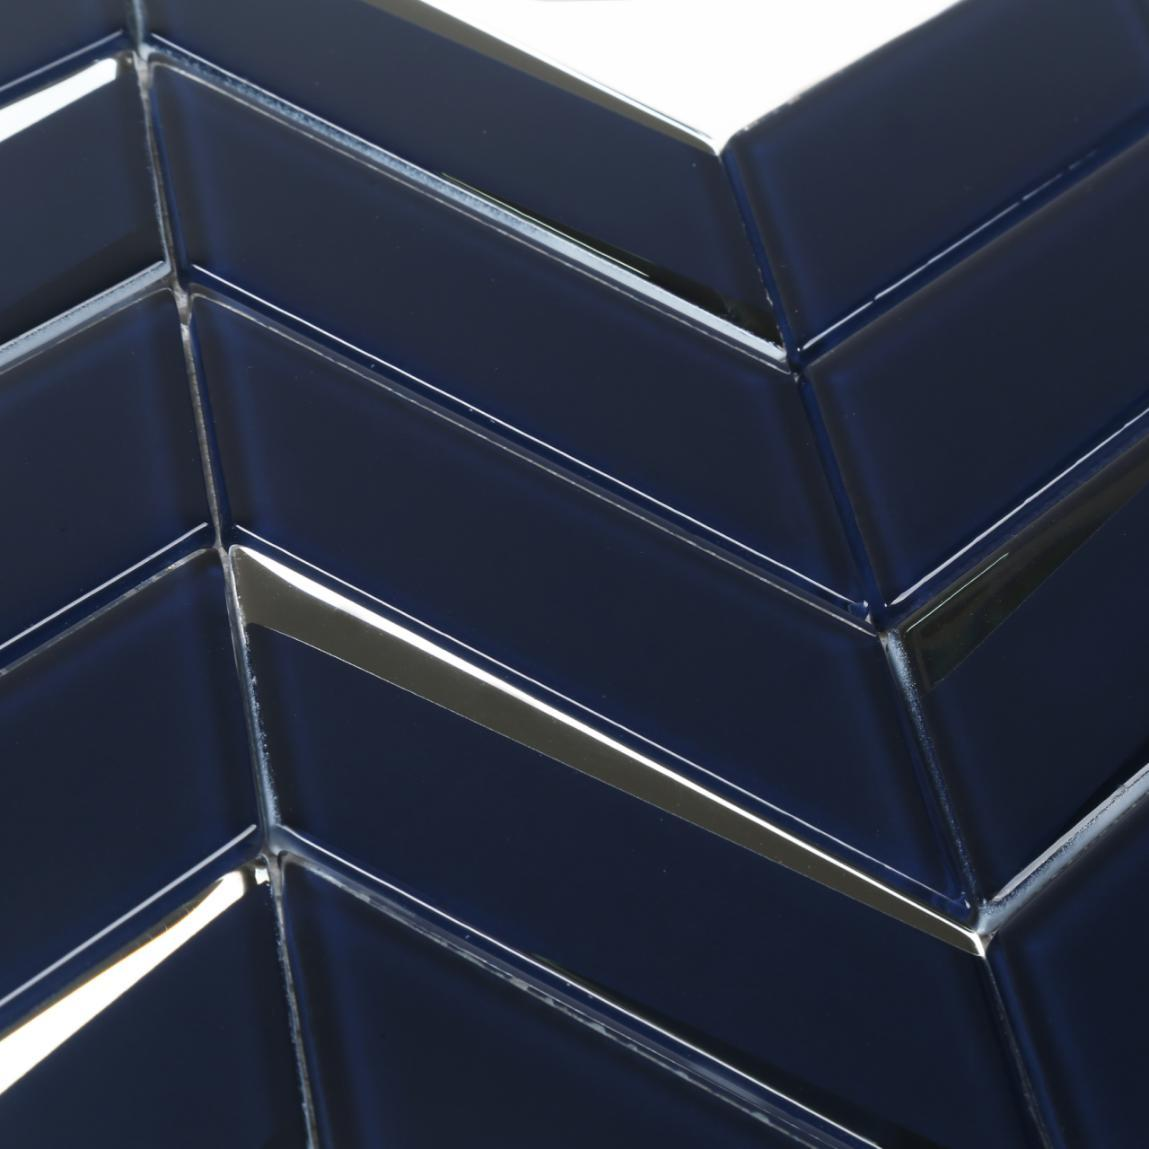 Chevron Shape Beveled Glass Mosaic Tile for Backsplash